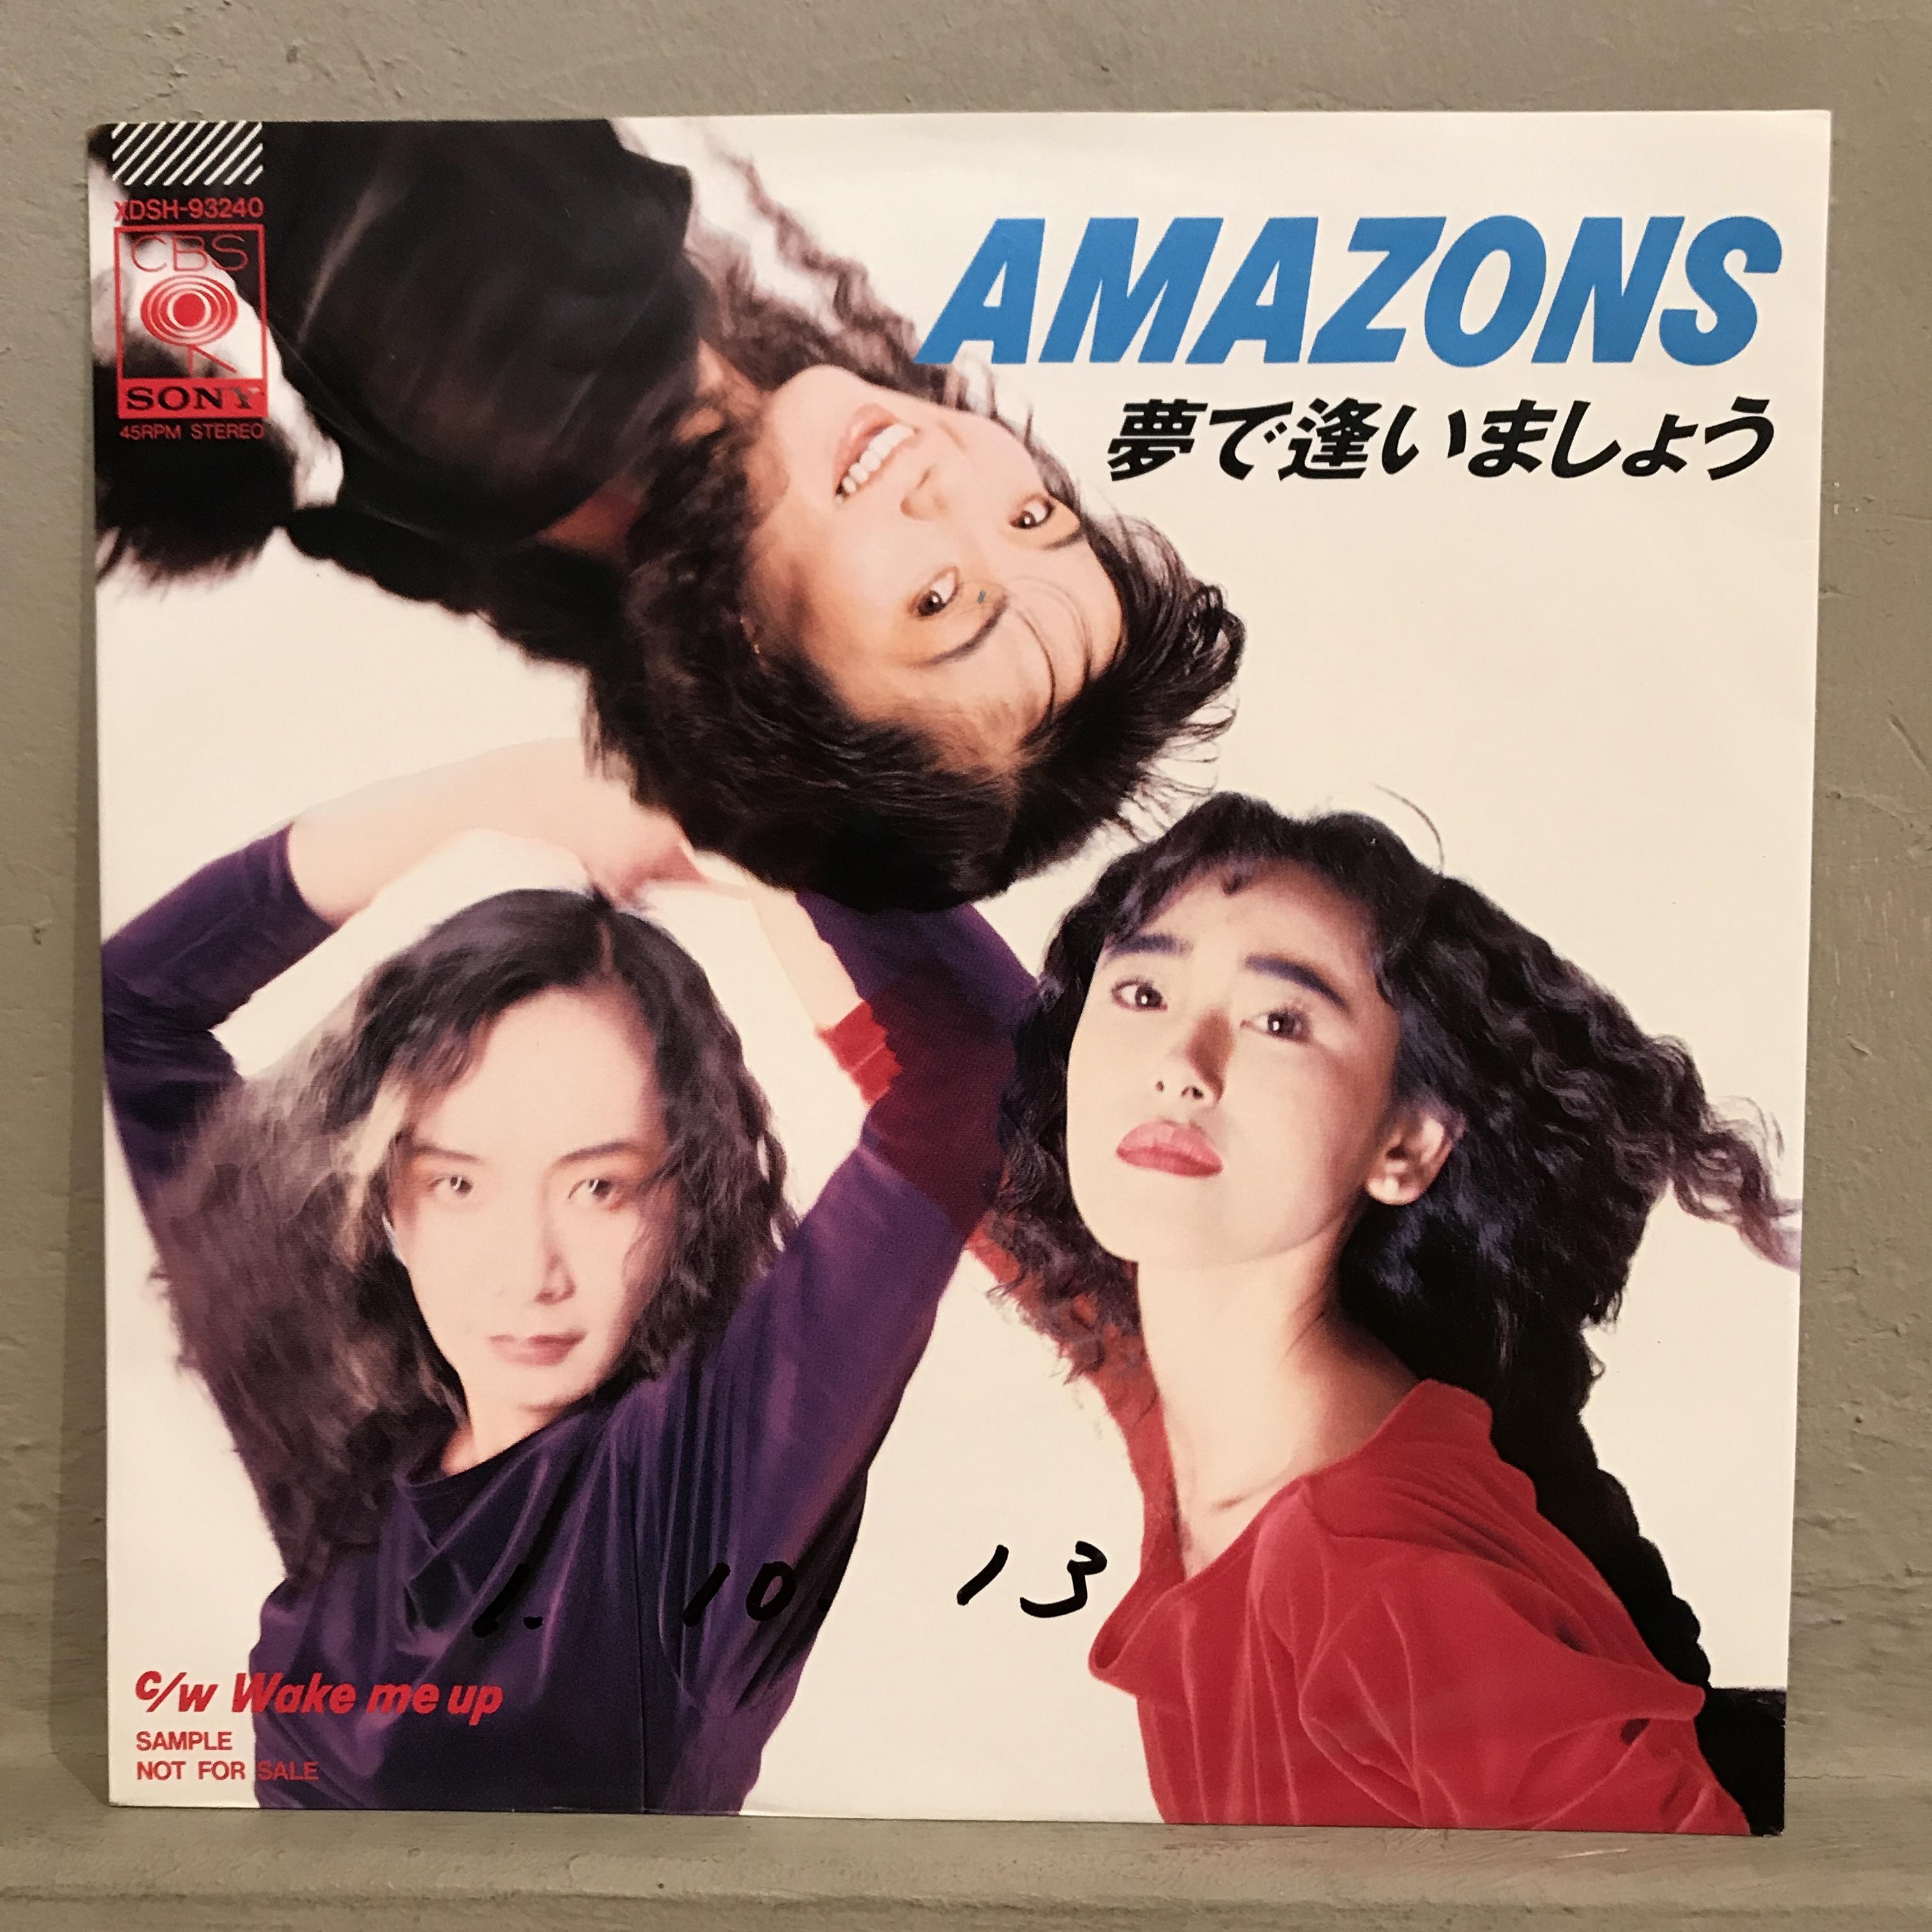 ●AMAZONS/夢で逢いましょう